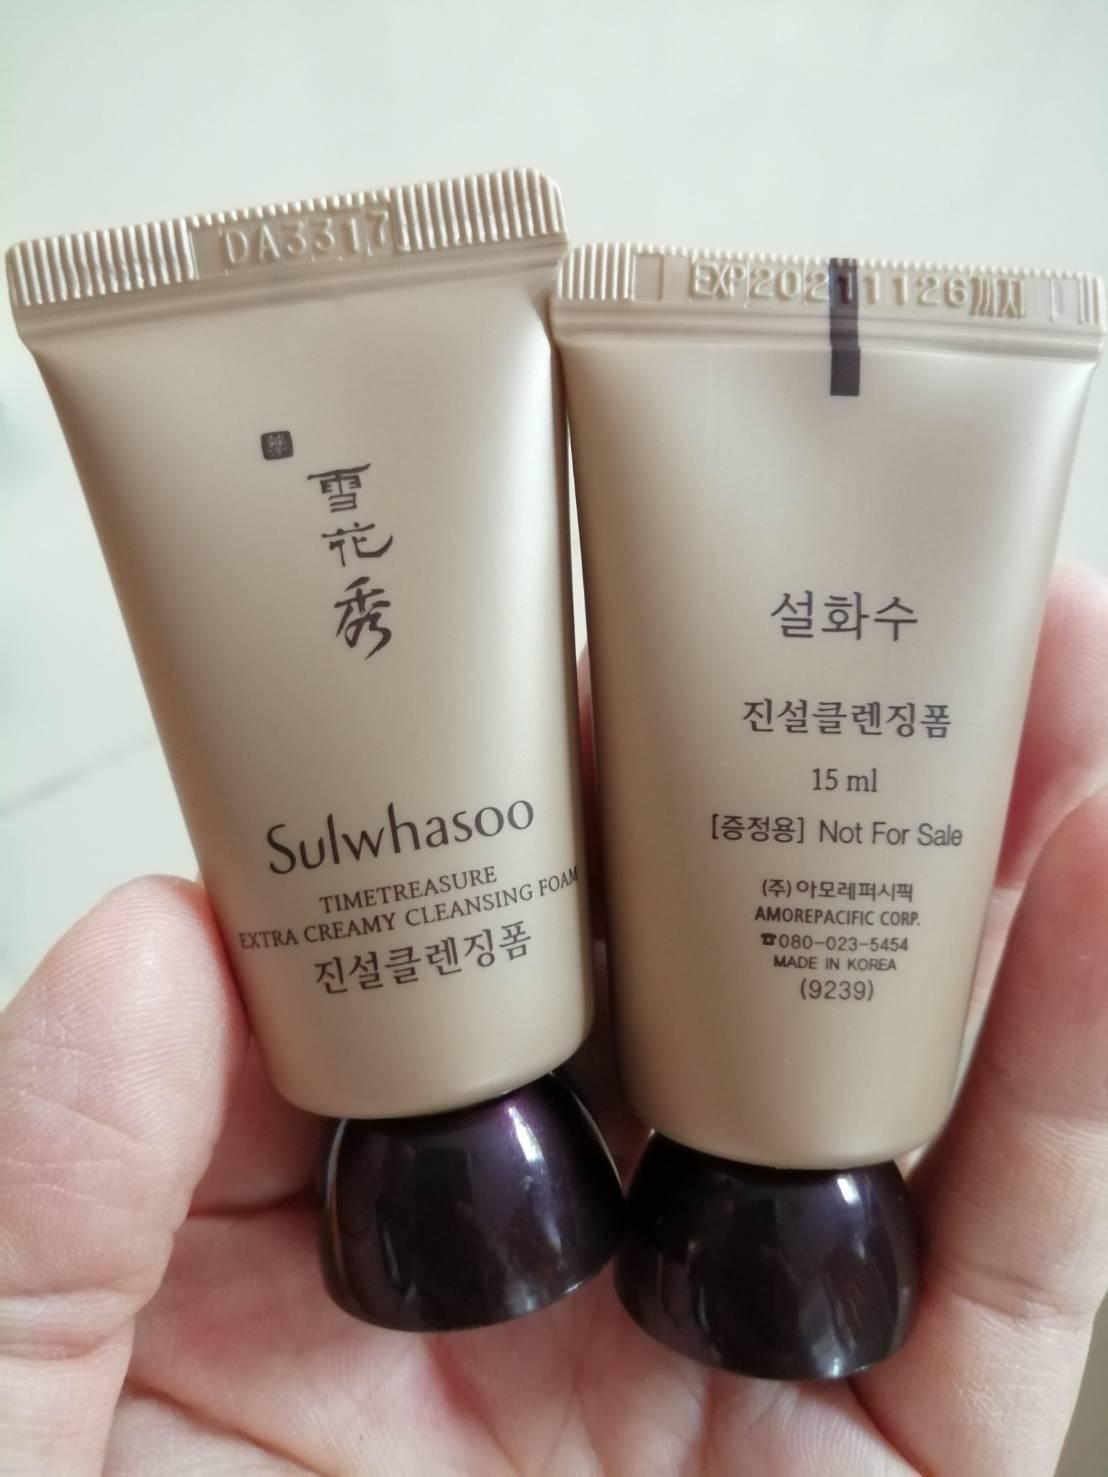 Sulwhasoo Timetreasure Extra Creamy Cleansing Foam 15ml.(ของแท้ขนาดทดลอง)